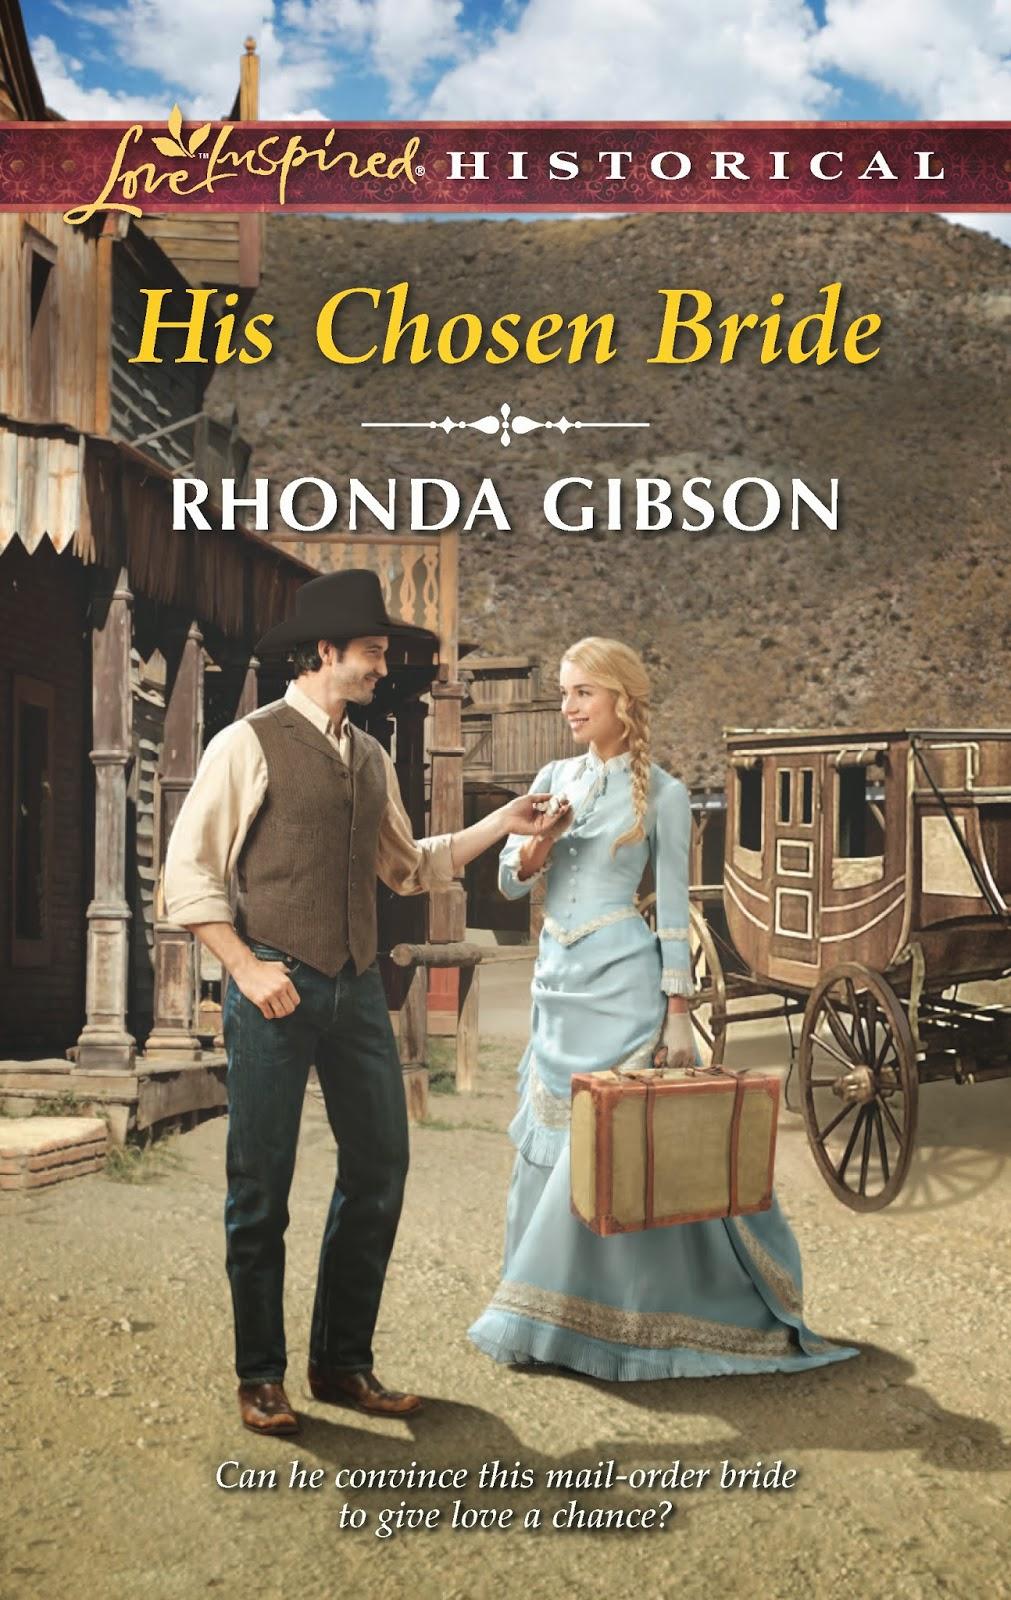 http://www.amazon.com/Chosen-Bride-Mills-Inspired-Historical-ebook/dp/B00GPDUUI8/ref=sr_1_2?s=books&ie=UTF8&qid=1394563253&sr=1-2&keywords=his+chosen+bride